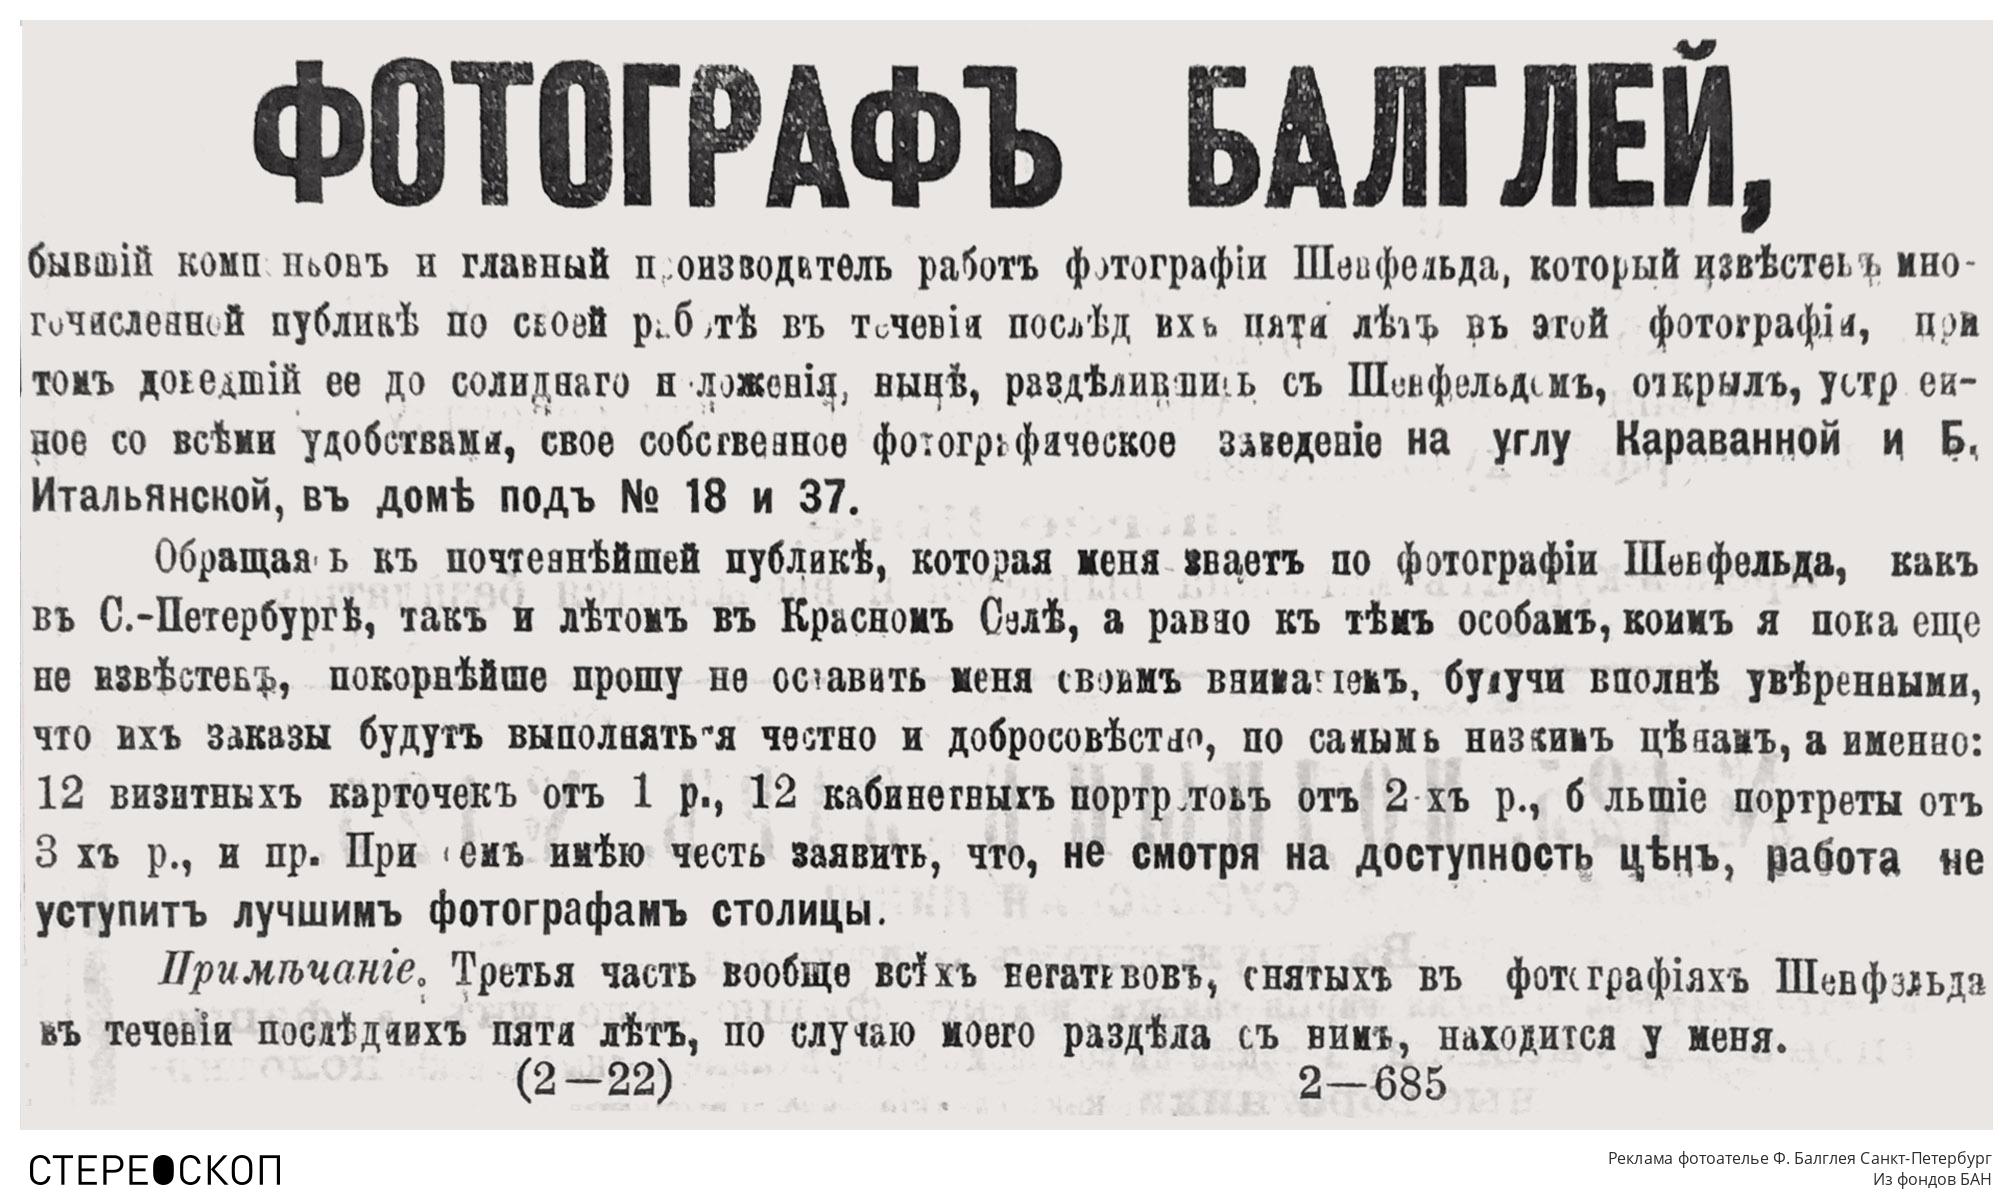 Реклама фотоателье Ф. Балглей Санкт-Петербург